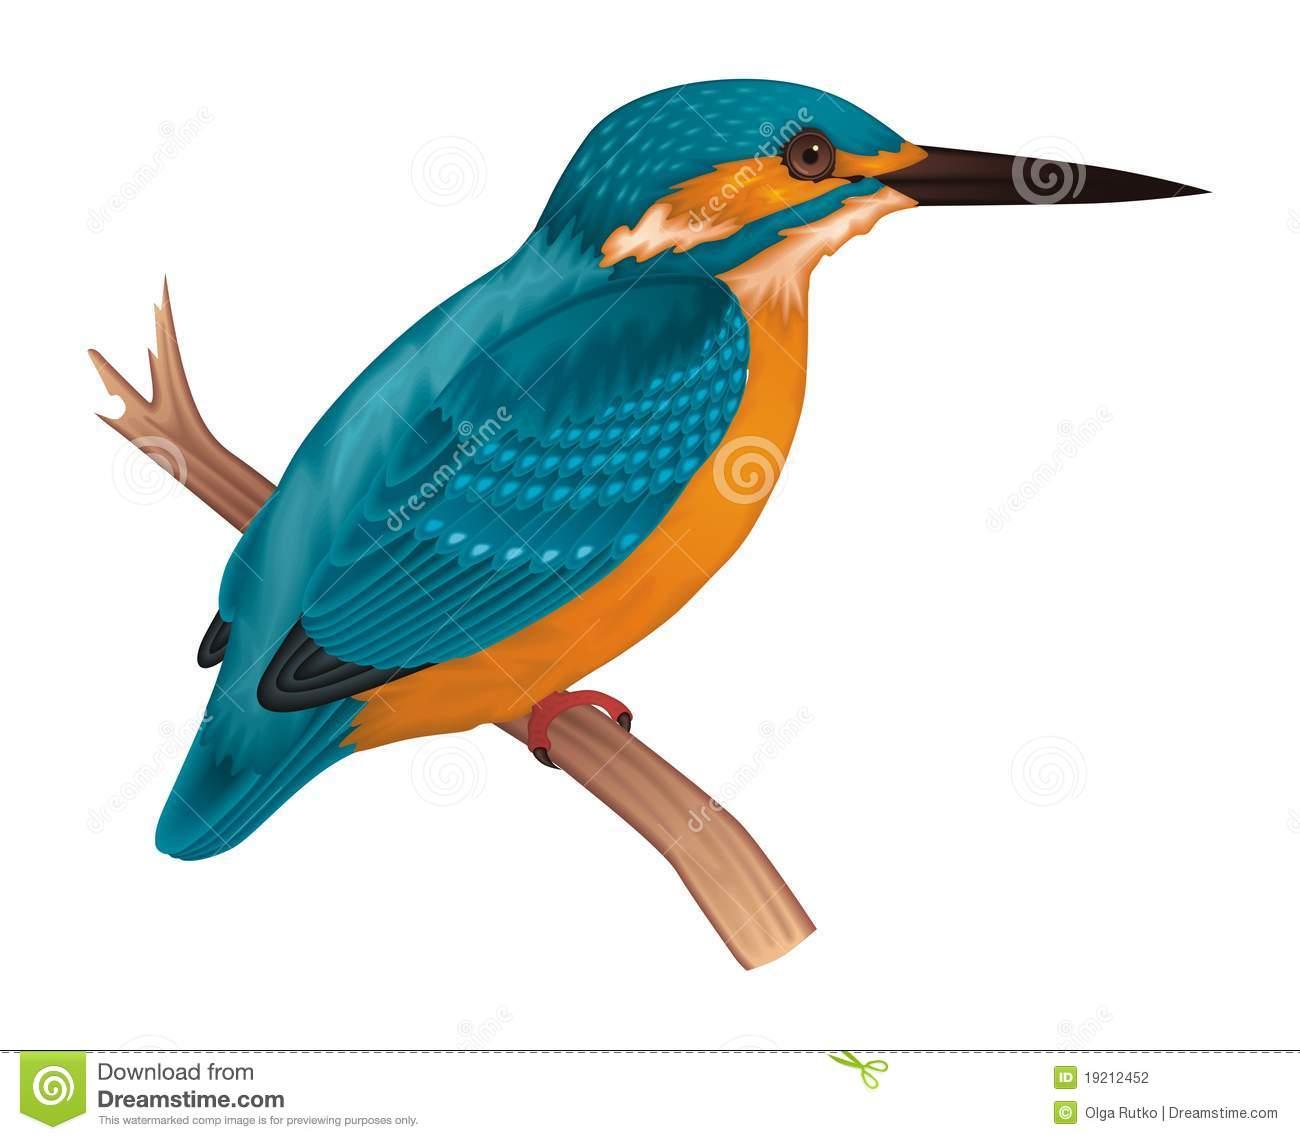 Kingfisher clipart #2